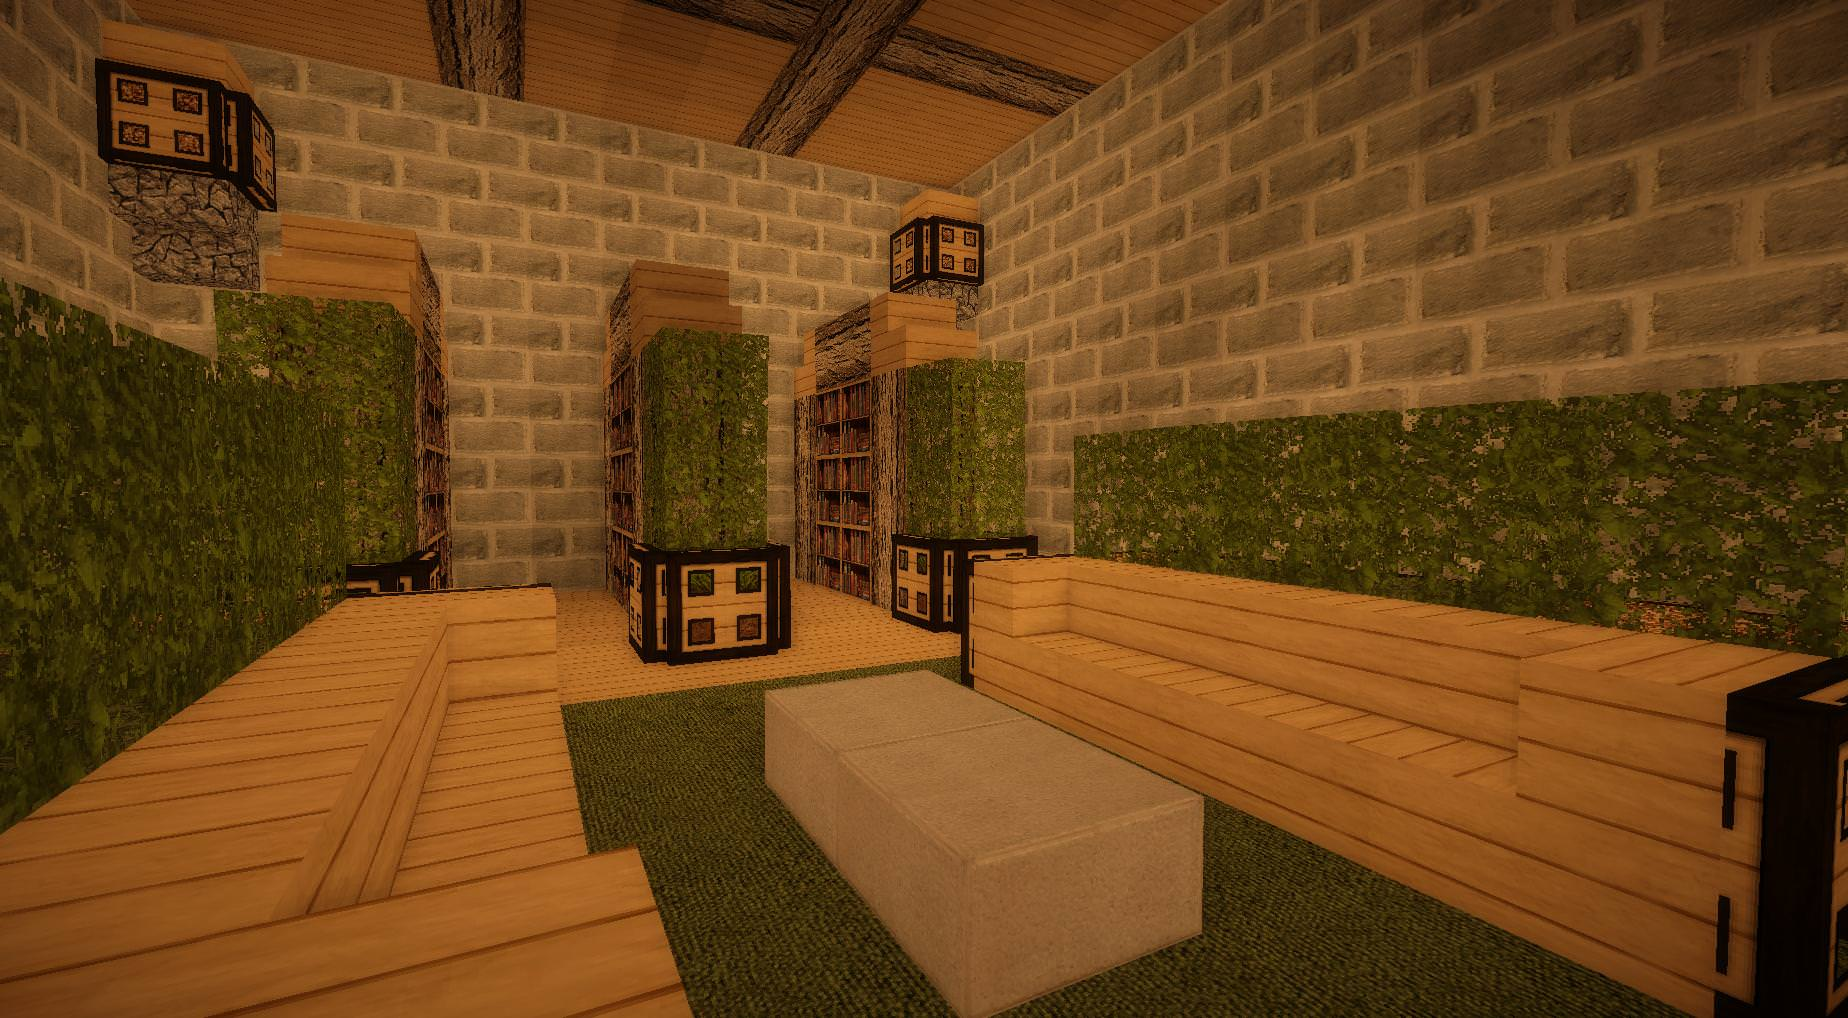 building imterior minecraft texture